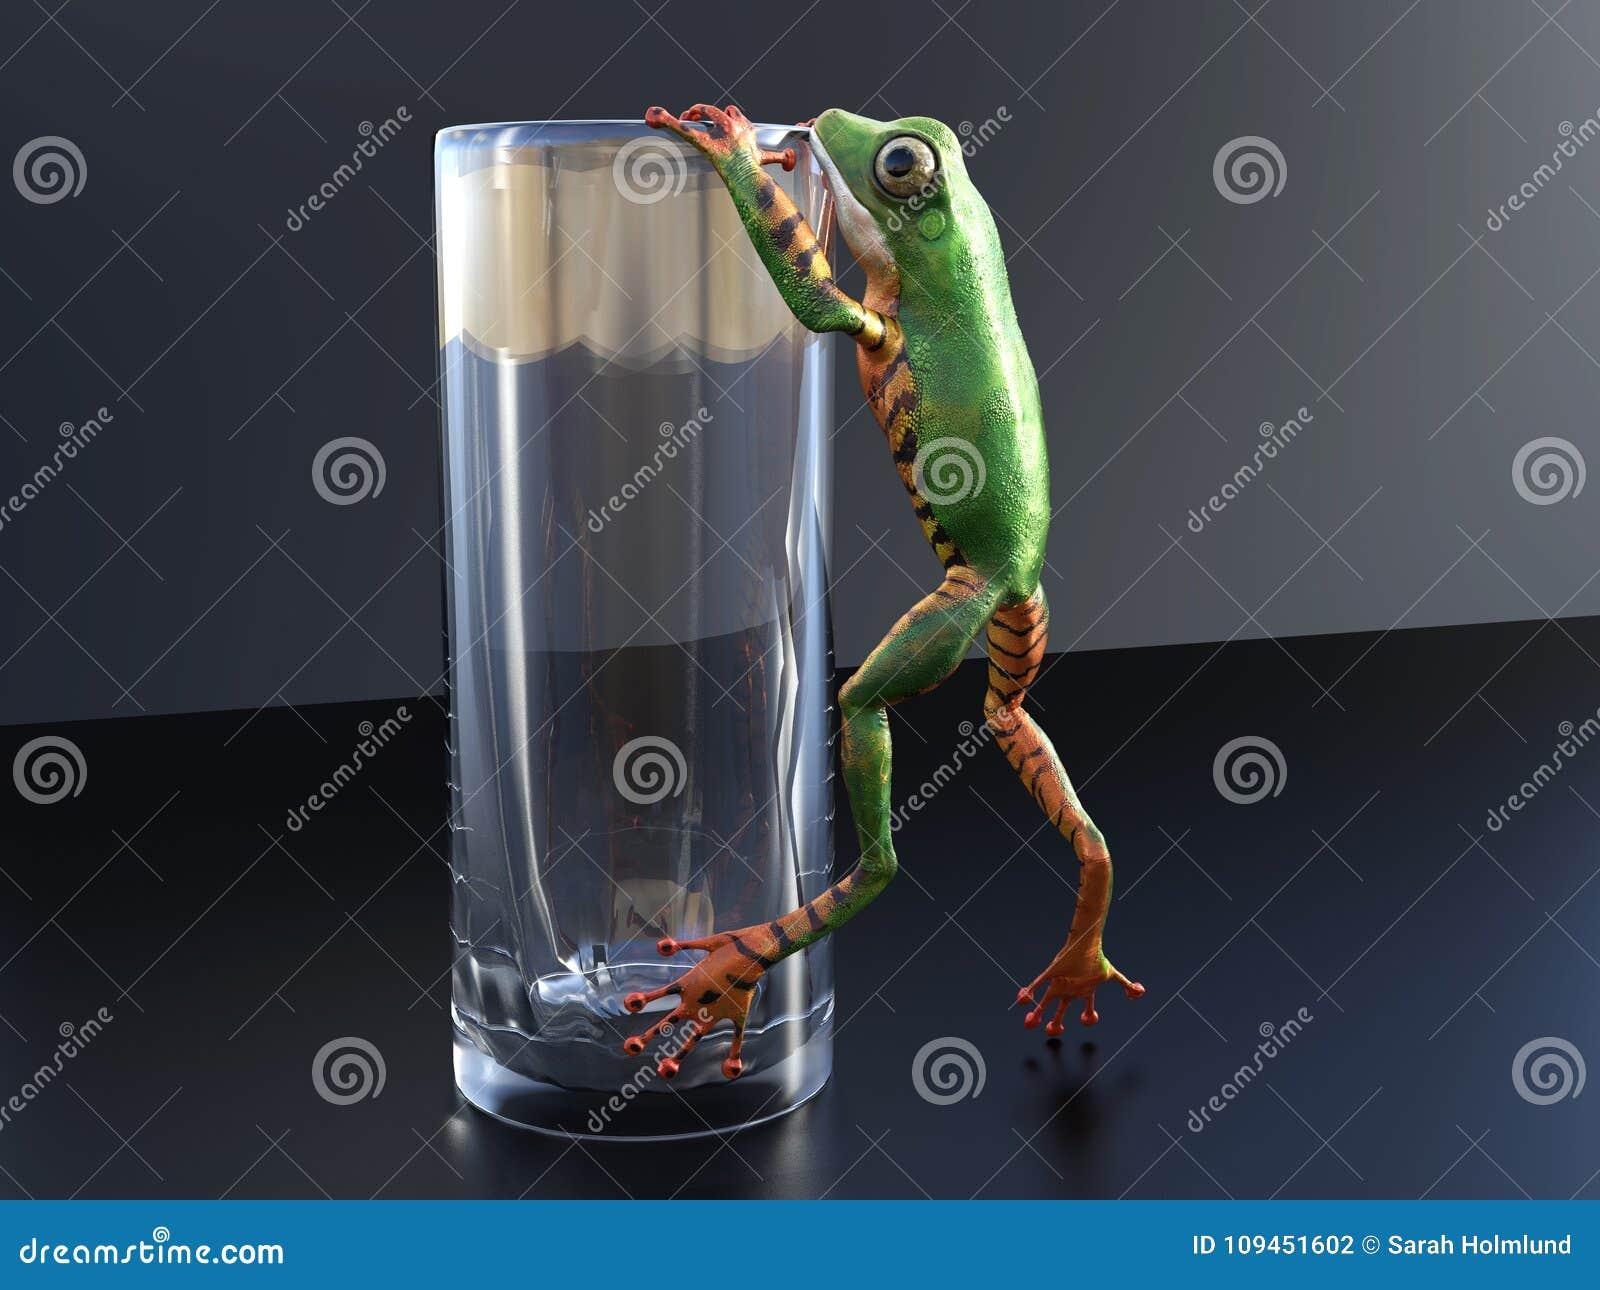 перевод 3D реалистической древесной лягушки взбираясь на стекле